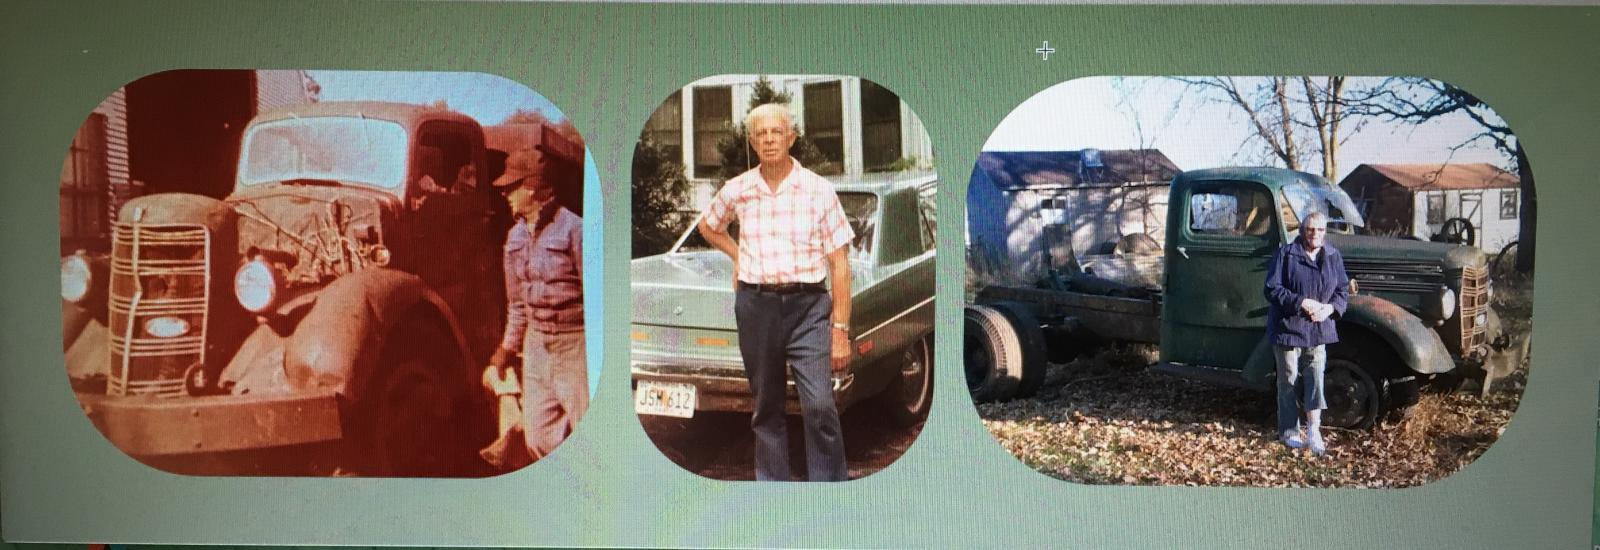 Great grandpa Gus, grandpa Jerry, and Grandma Betty and Gus #9